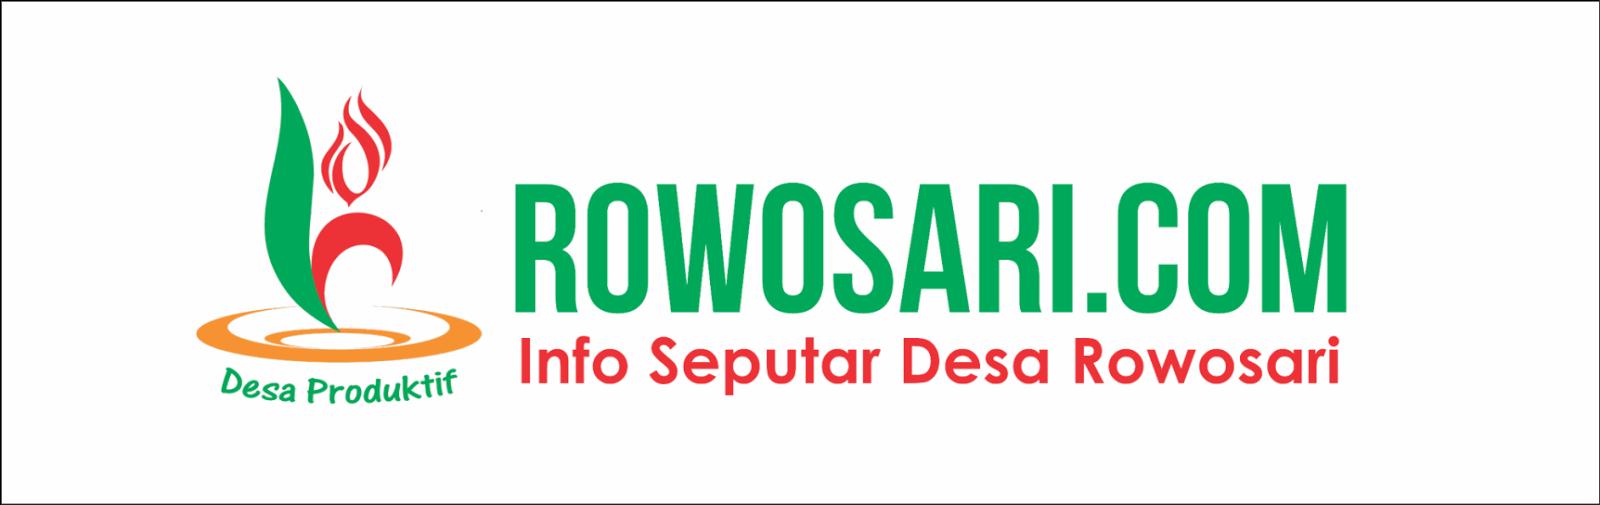 Despro Rowosari